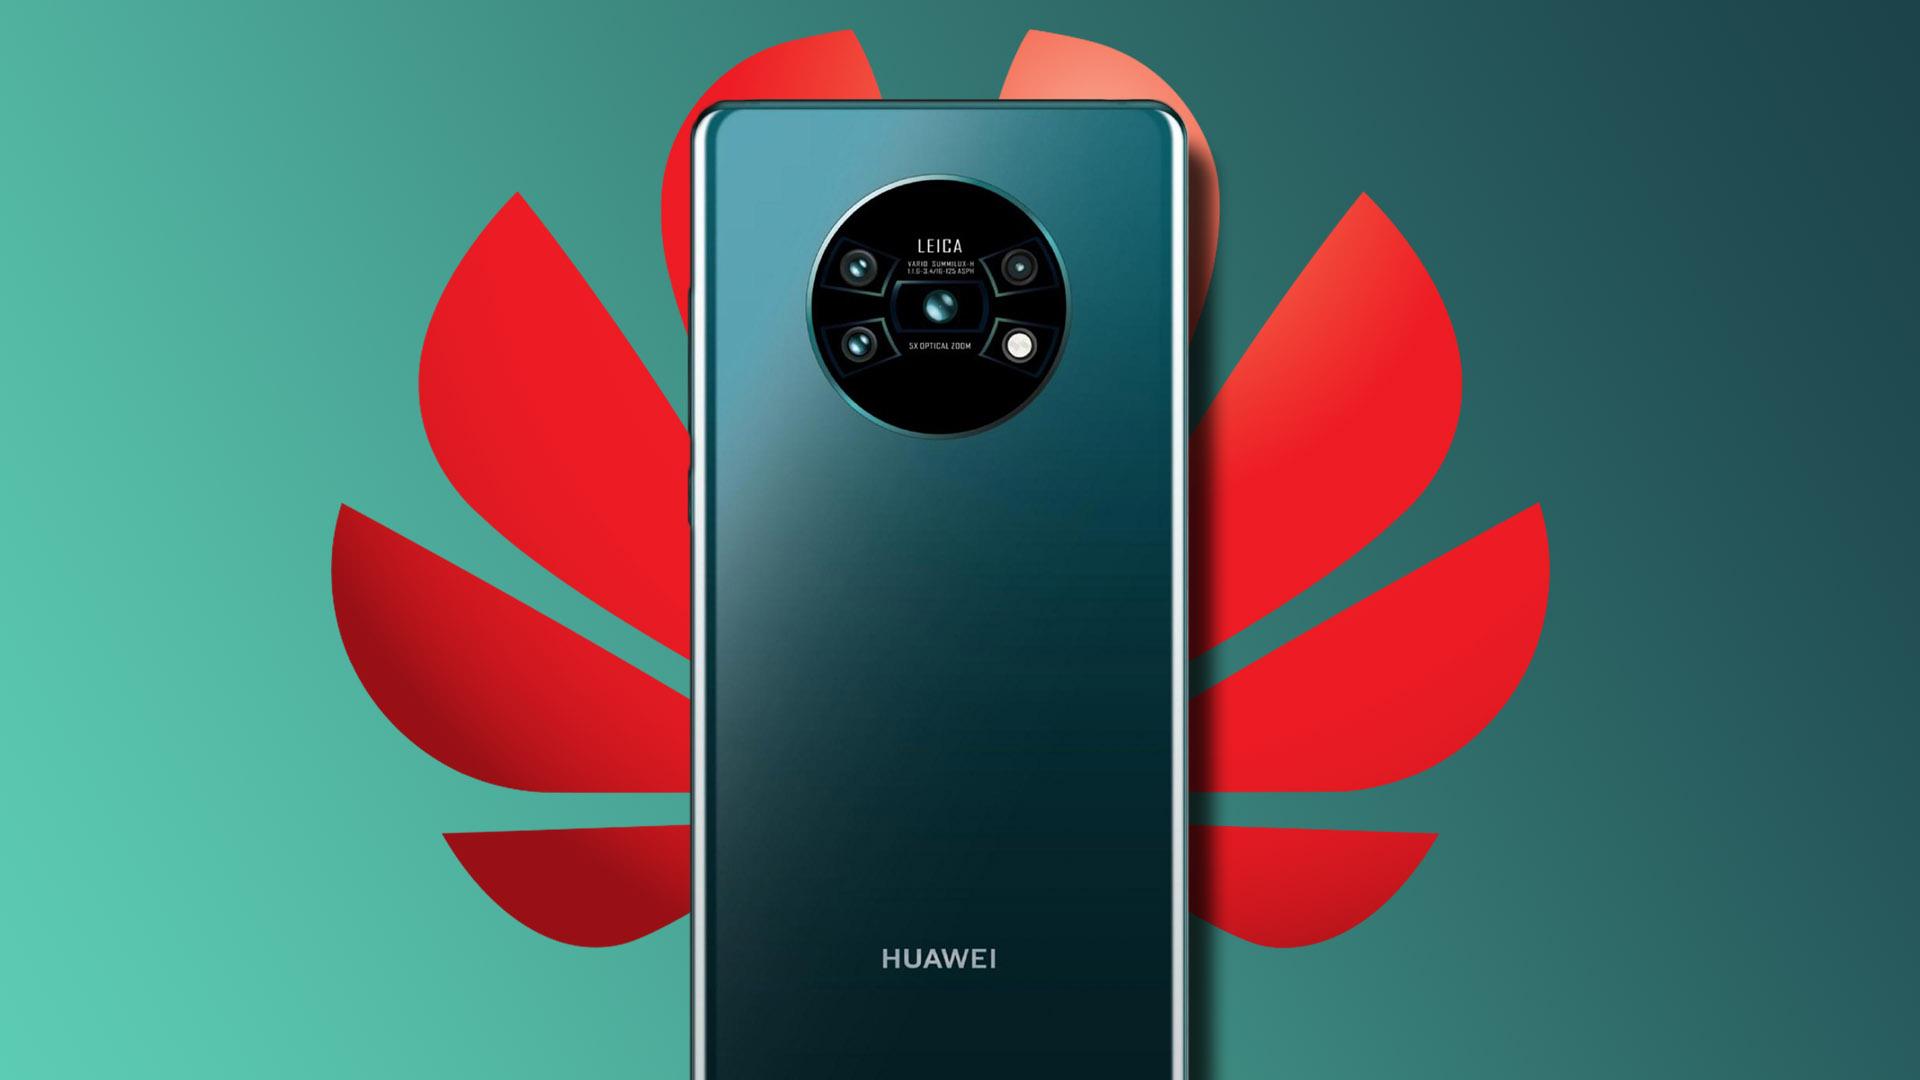 Huawei Mate 30, Mate 30 Pro november release